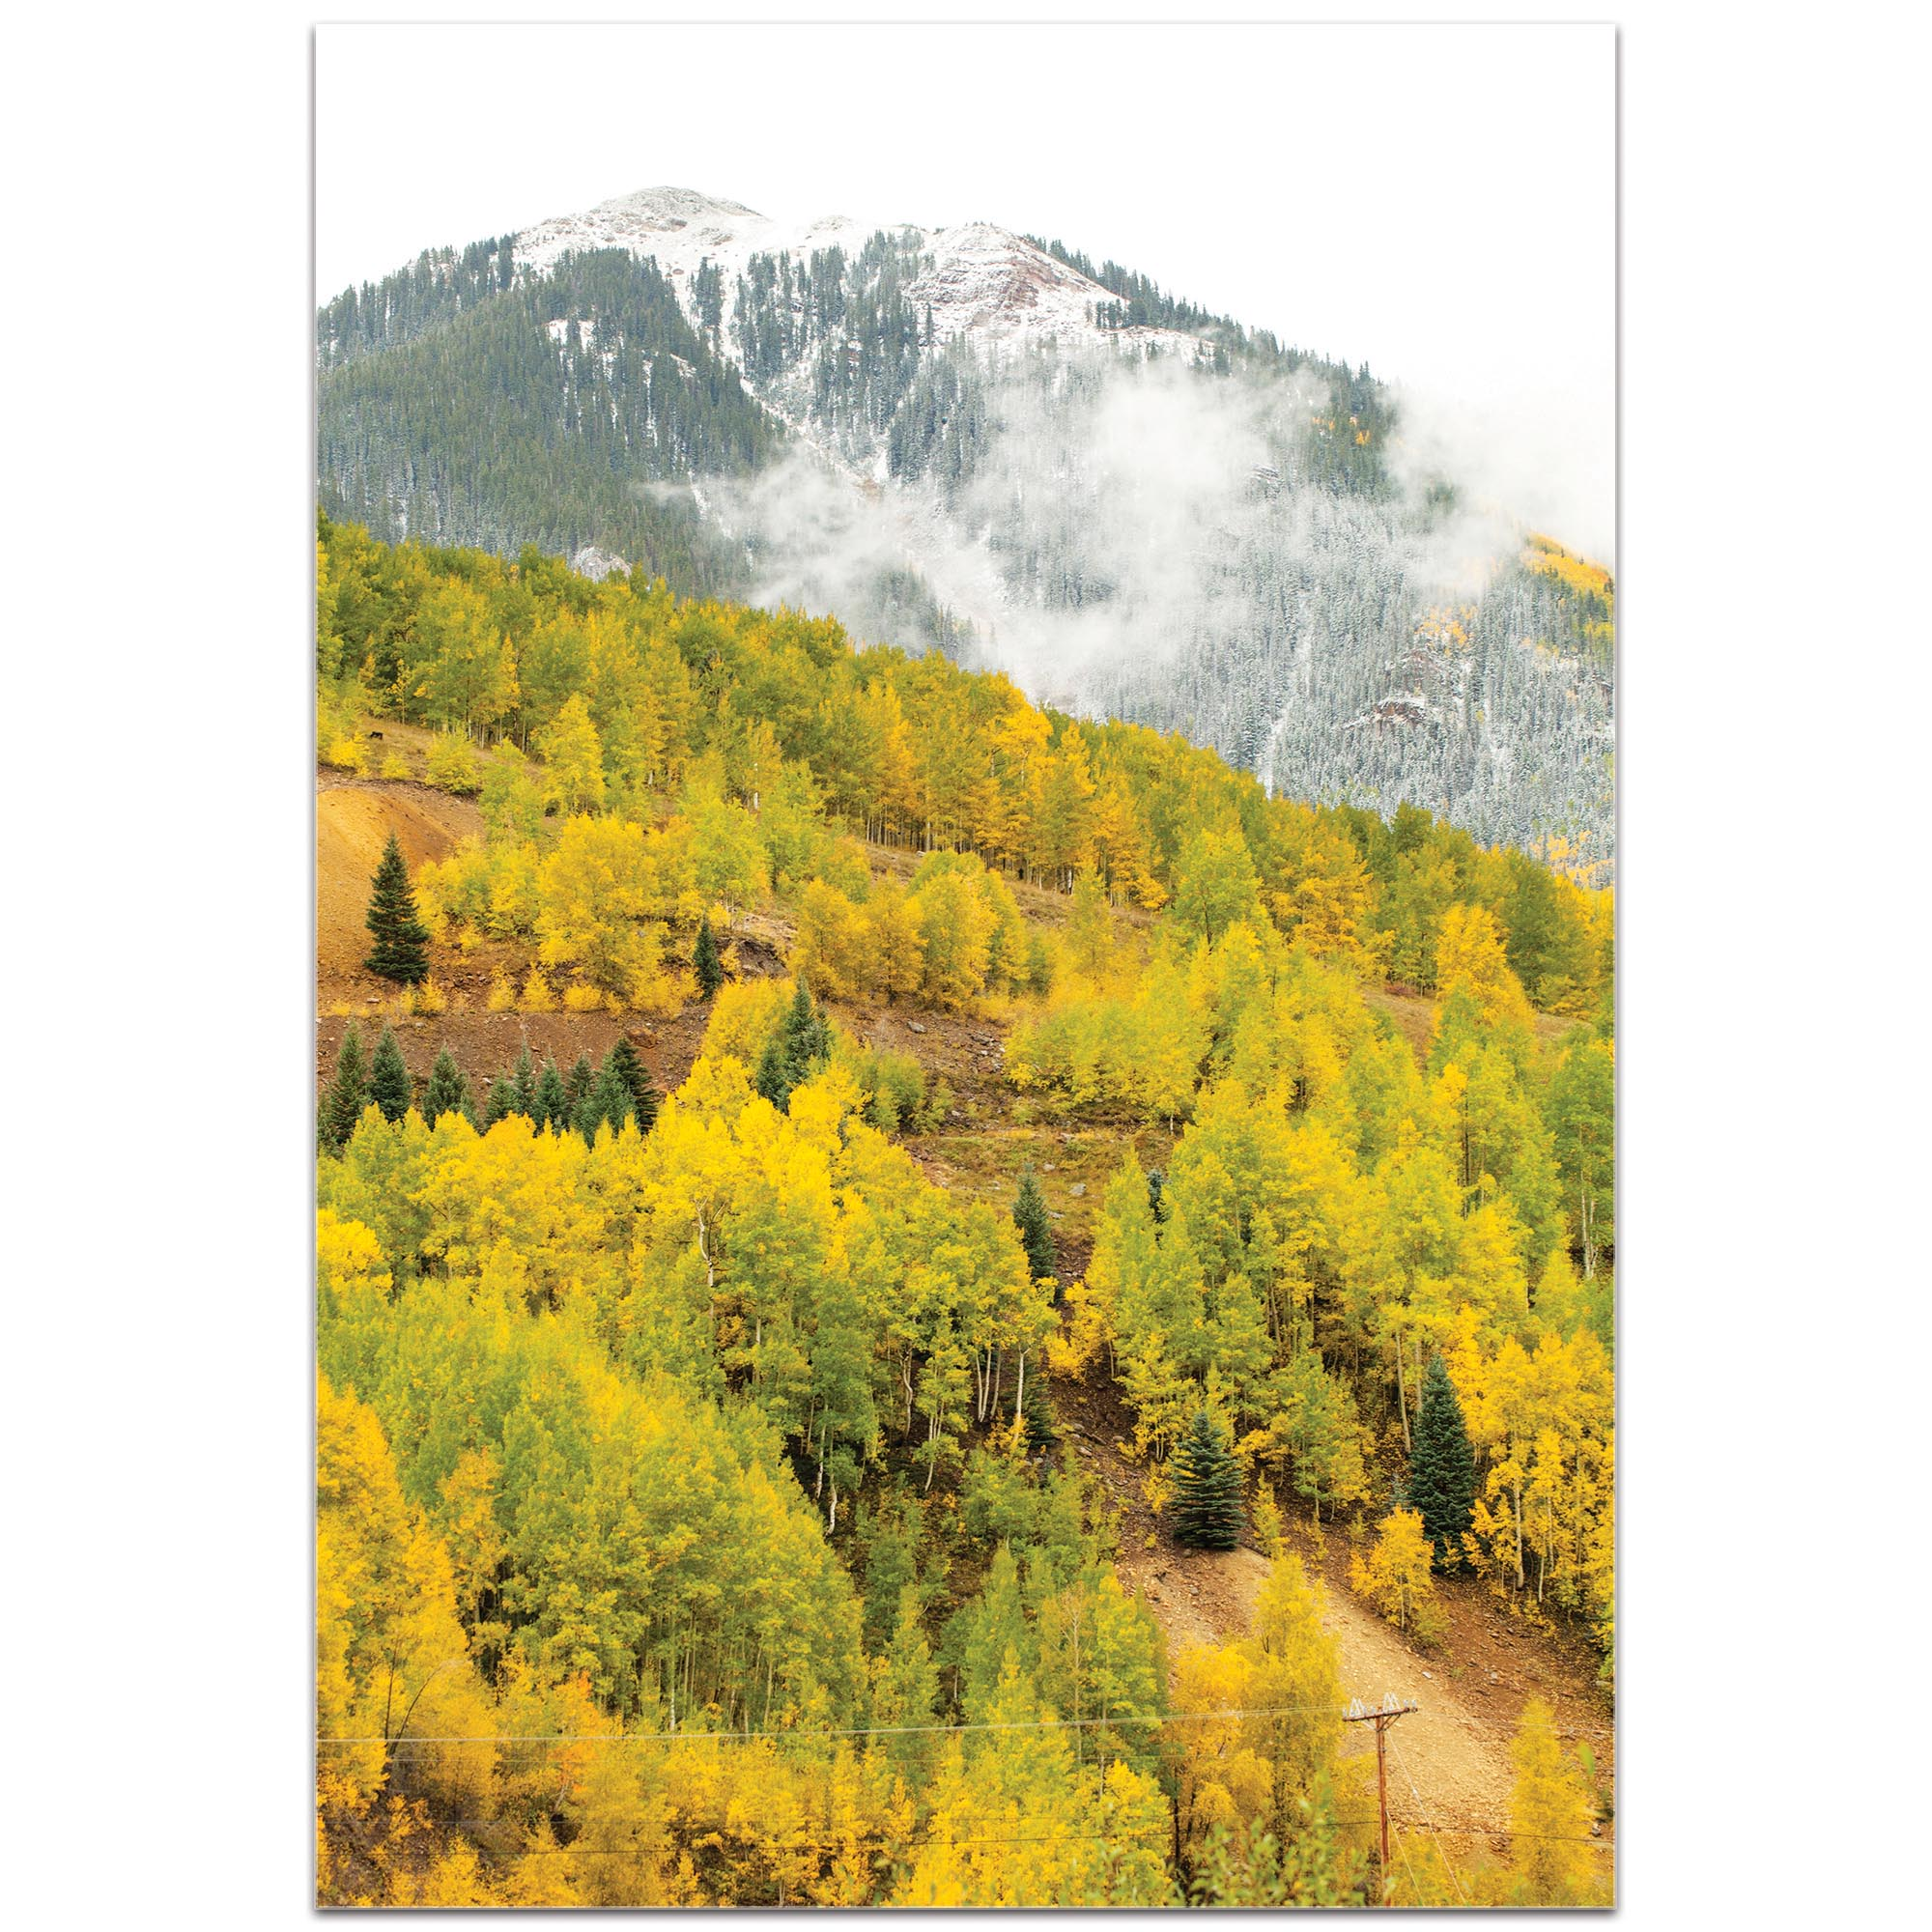 Landscape Photography 'Changing Season' - Autumn Nature Art on Metal or Plexiglass - Image 2